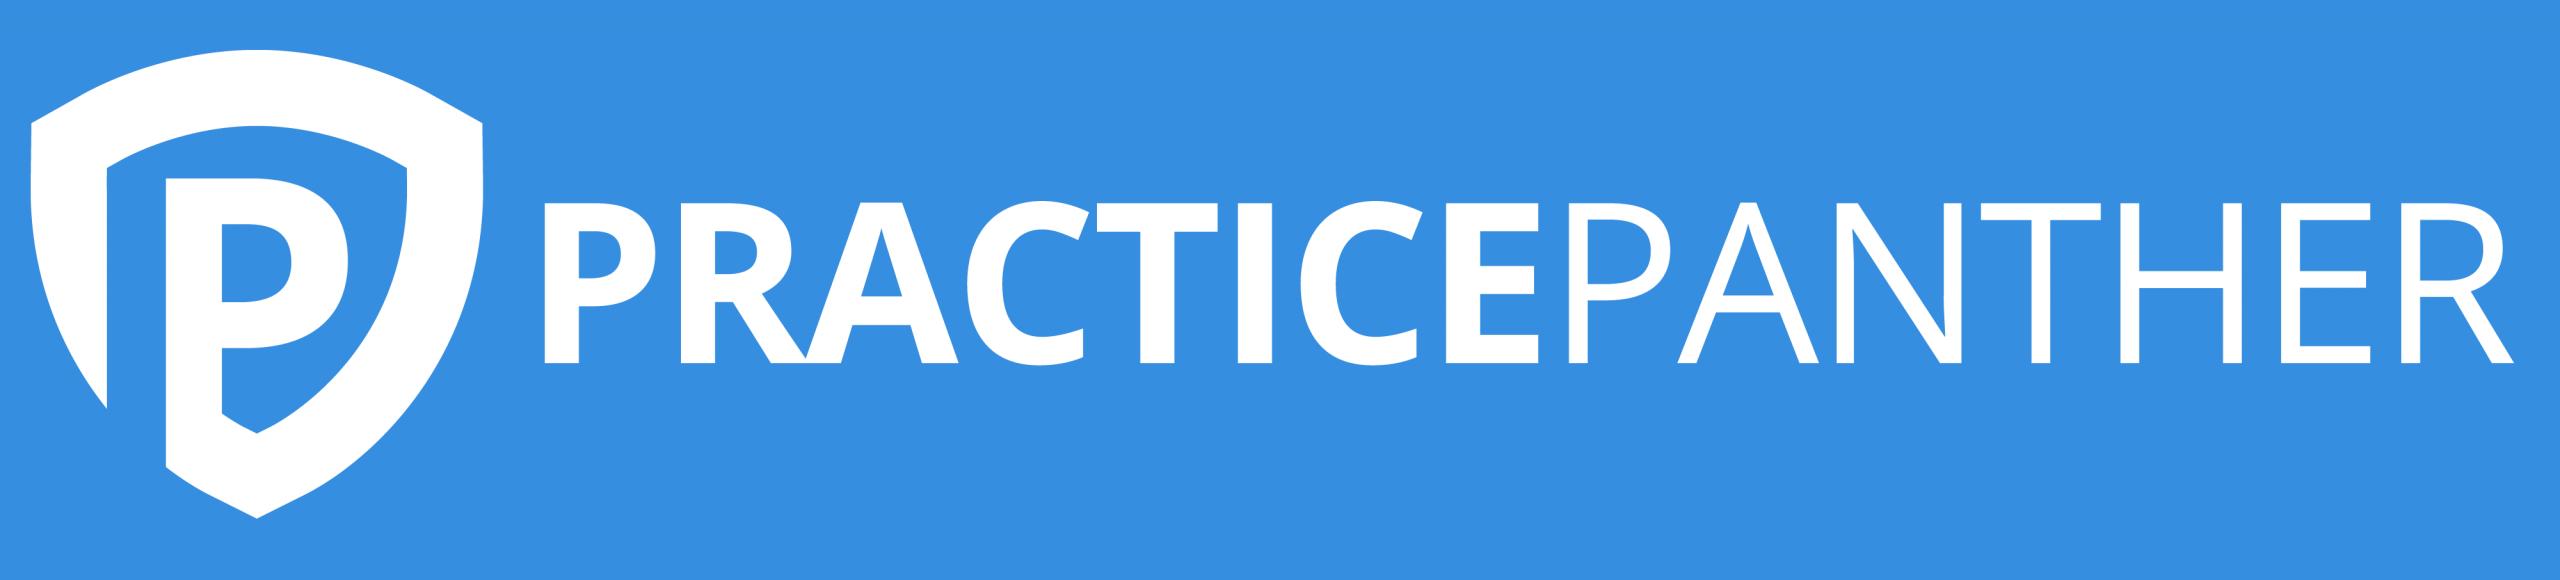 PracticePanther Integrations | Legal Software | EfforlessLegal